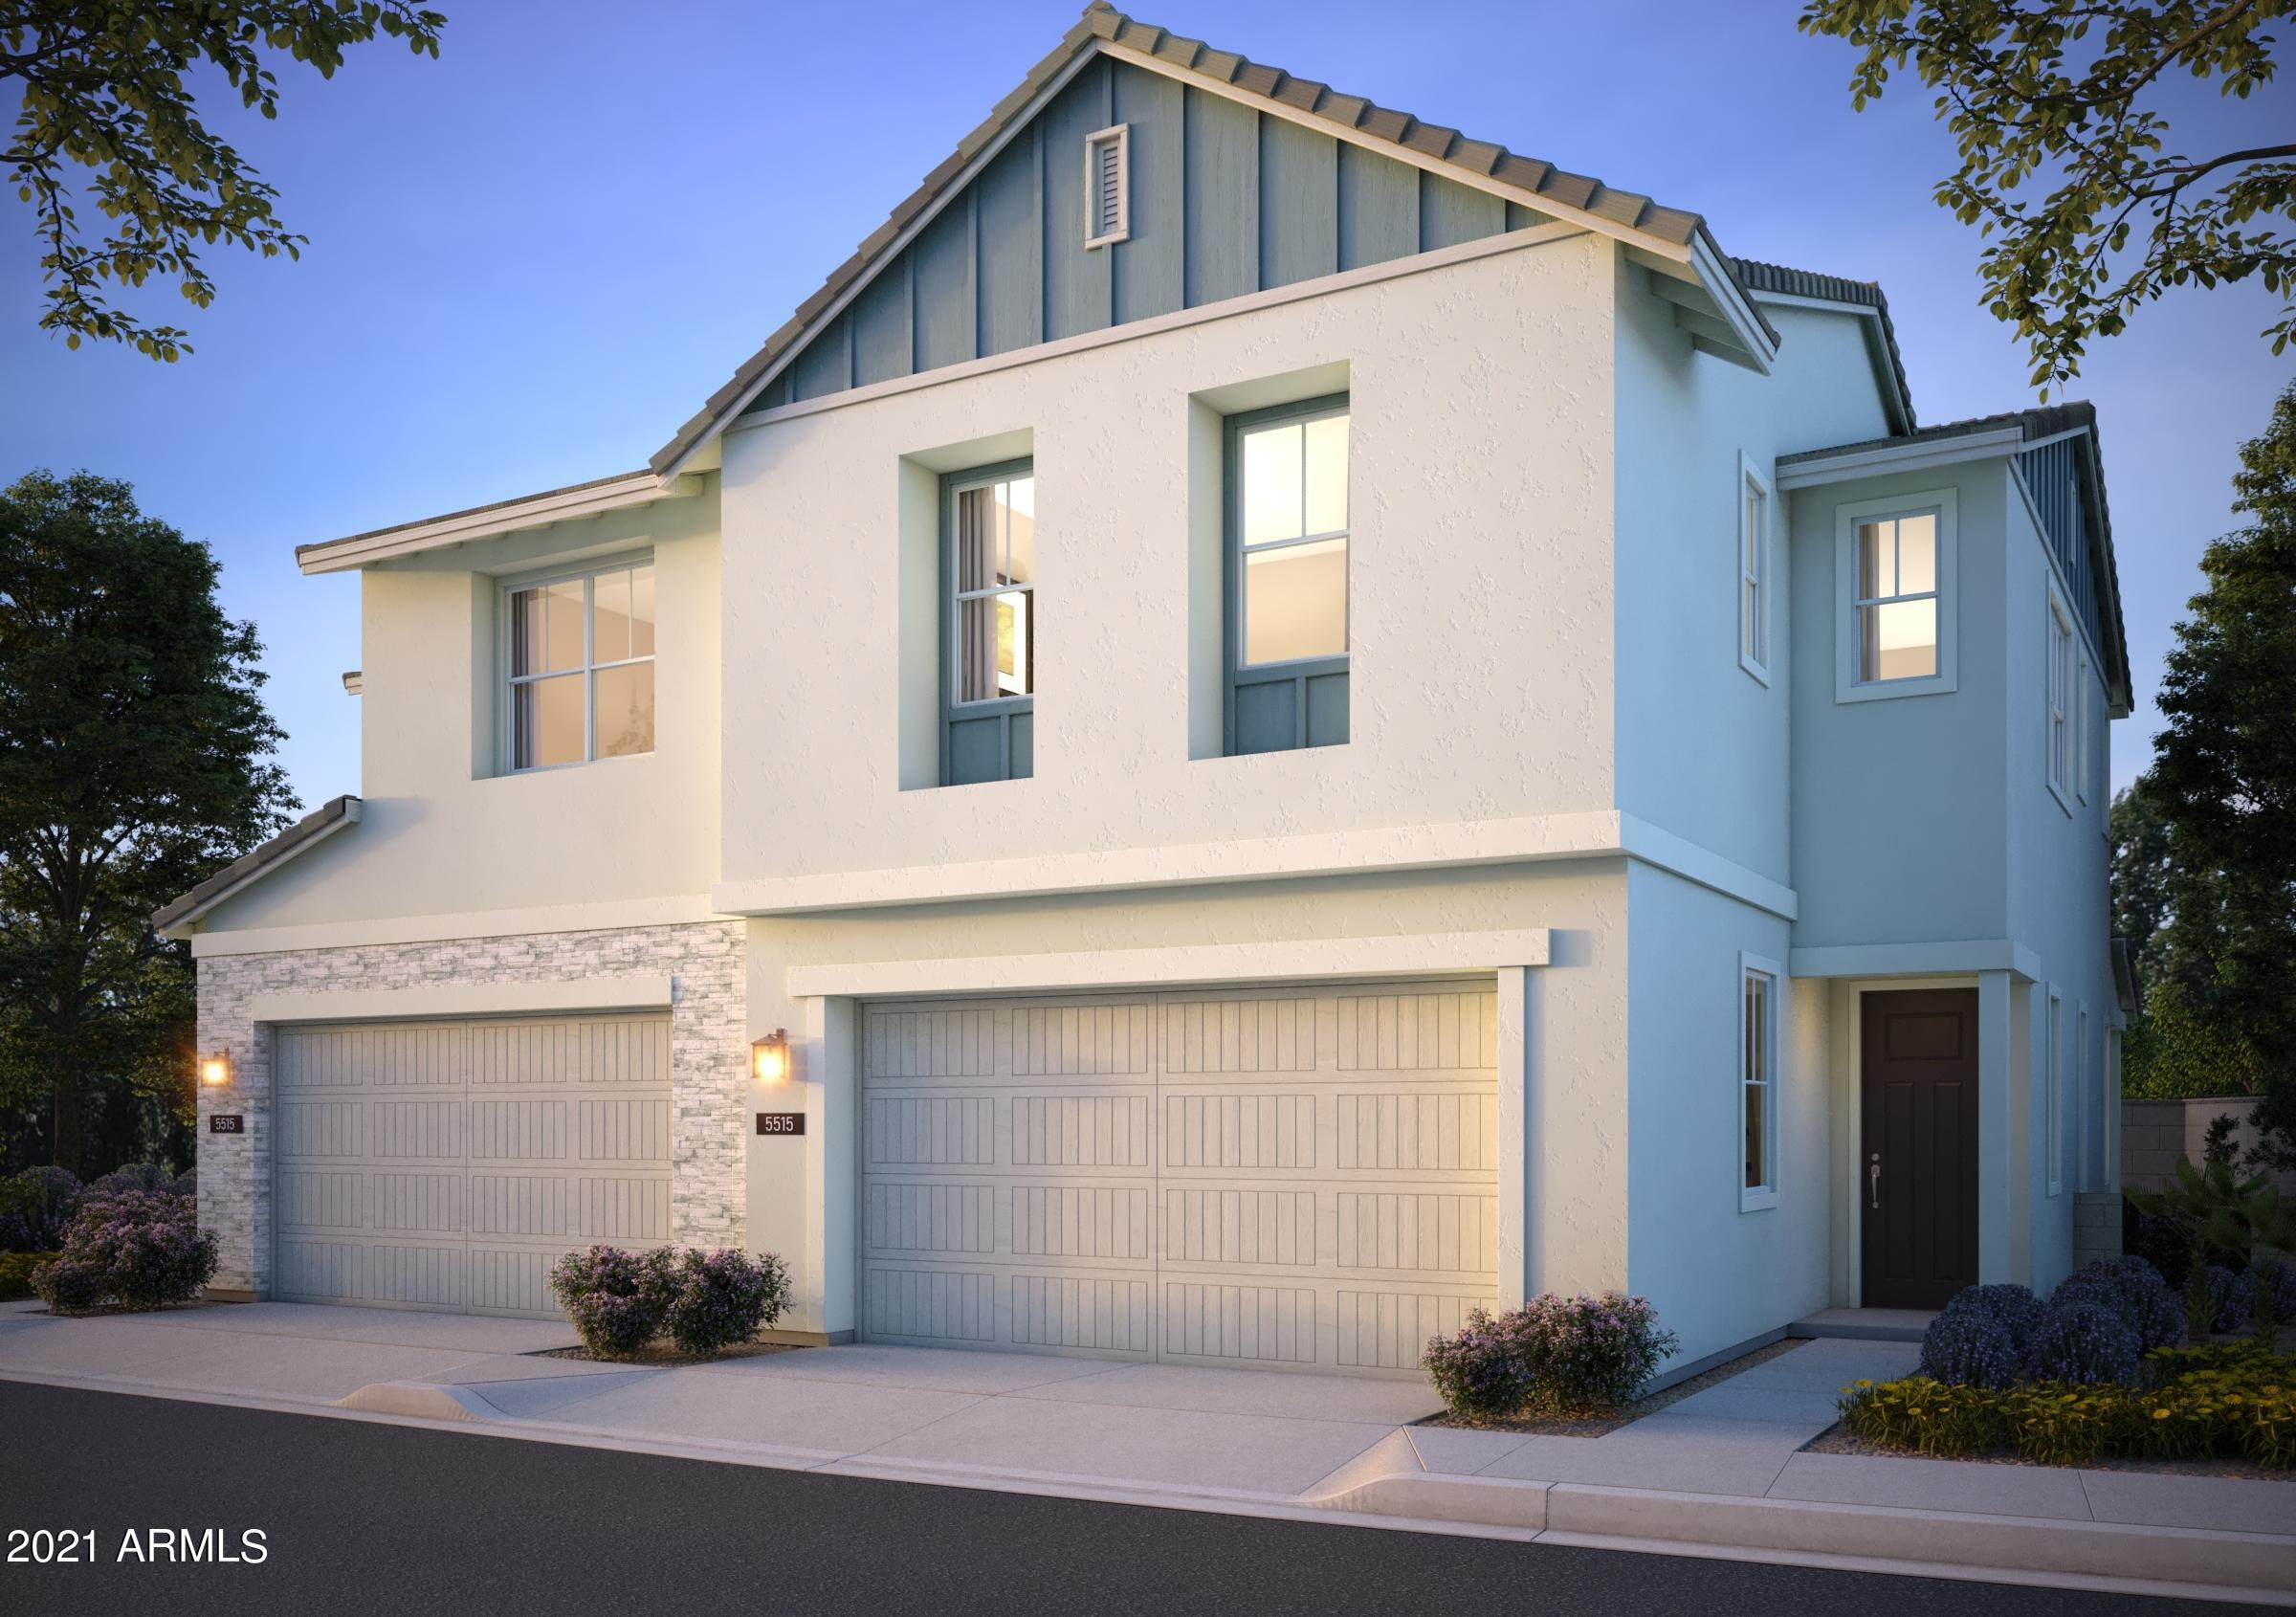 MLS 6269499 2765 S APACHE Drive, Chandler, AZ 85286 Chandler AZ Condo or Townhome